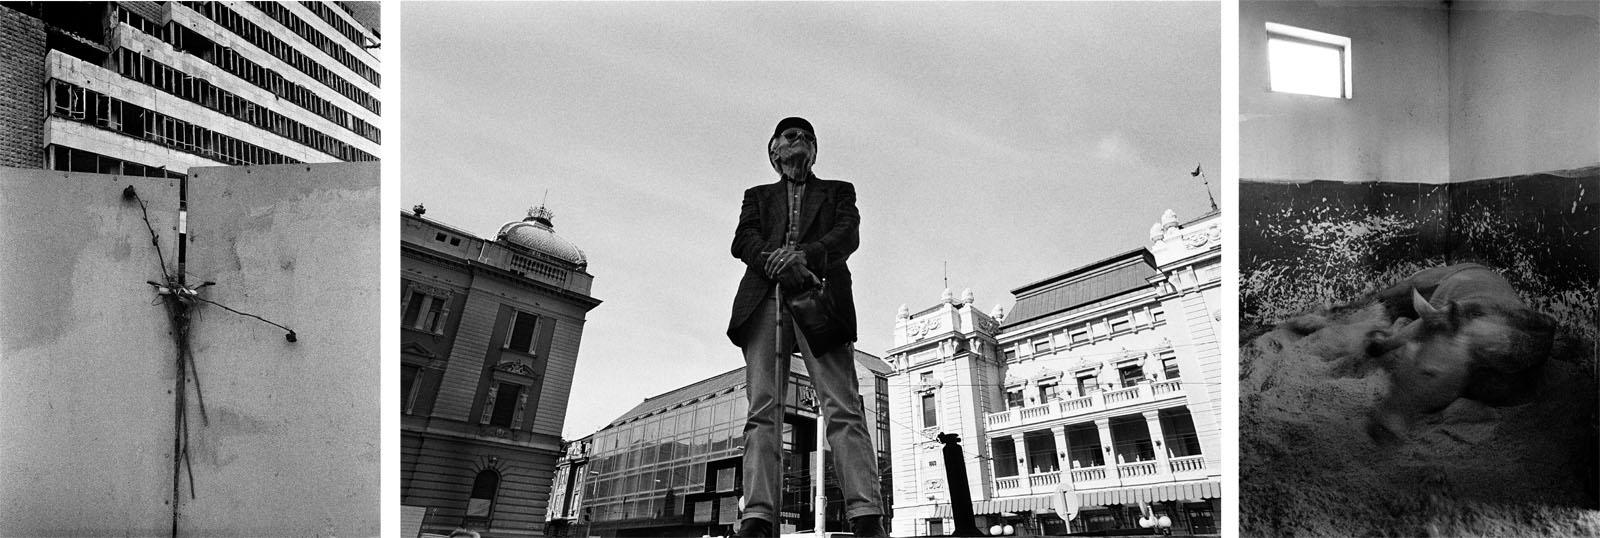 Art and Documentary Photography - Loading BGD___Fabio_Sgroi_015.jpg